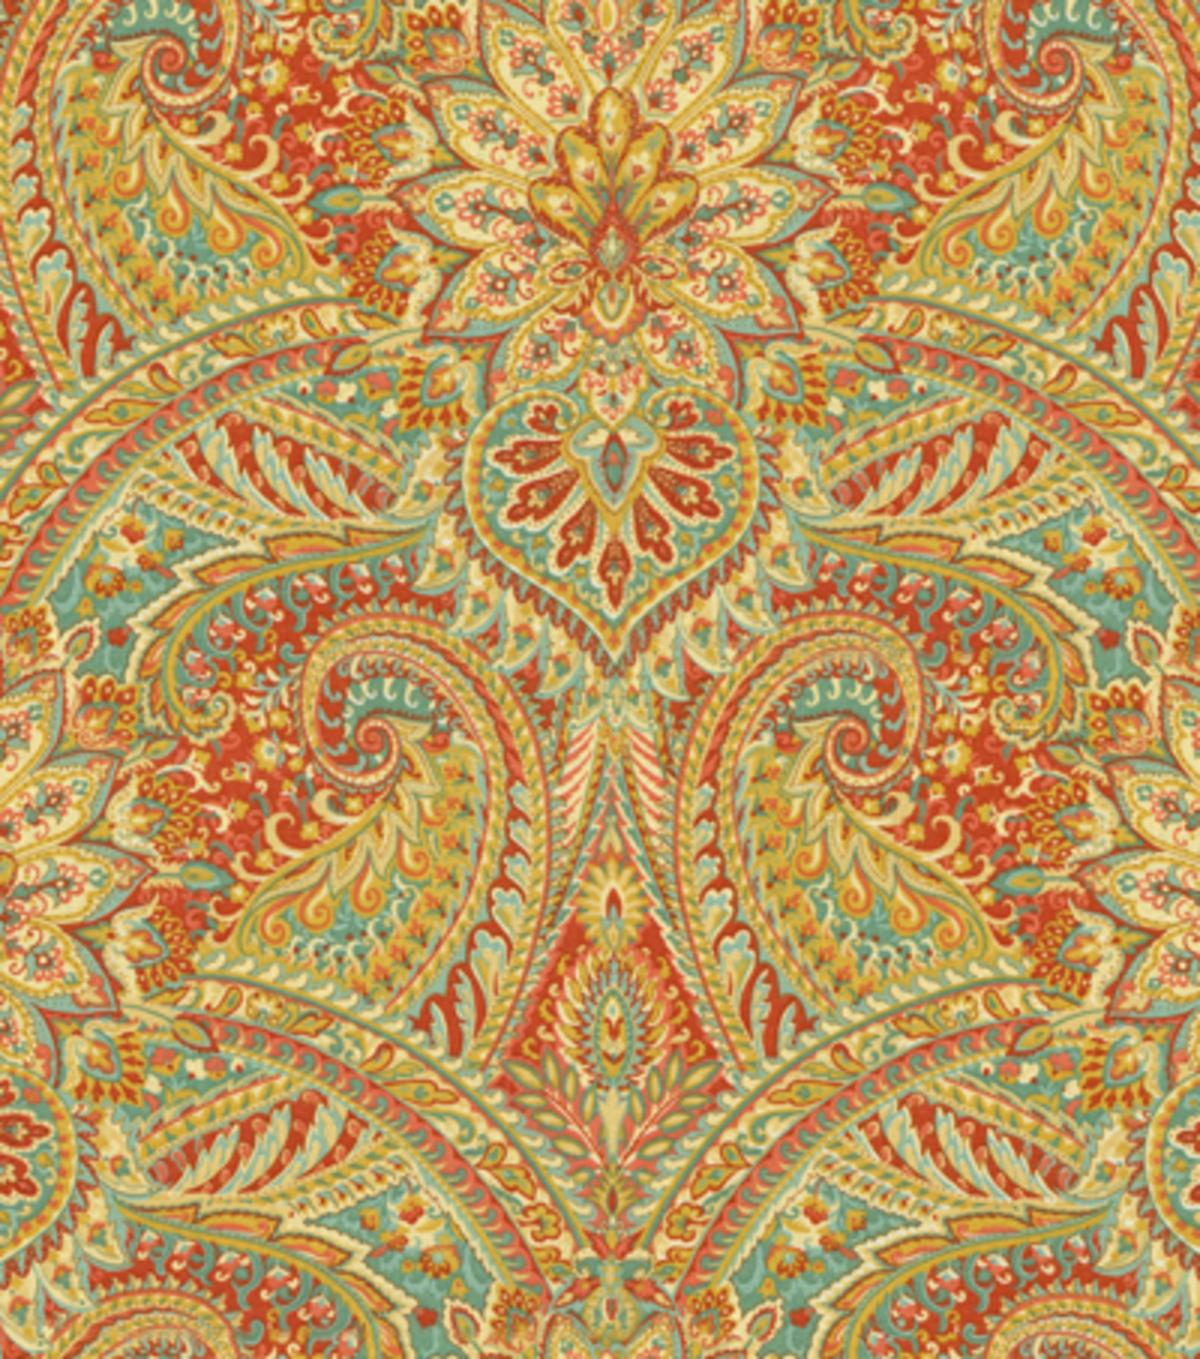 Home Decor Fabric: Home Decor Print Fabric- Waverly Swept Away Berry